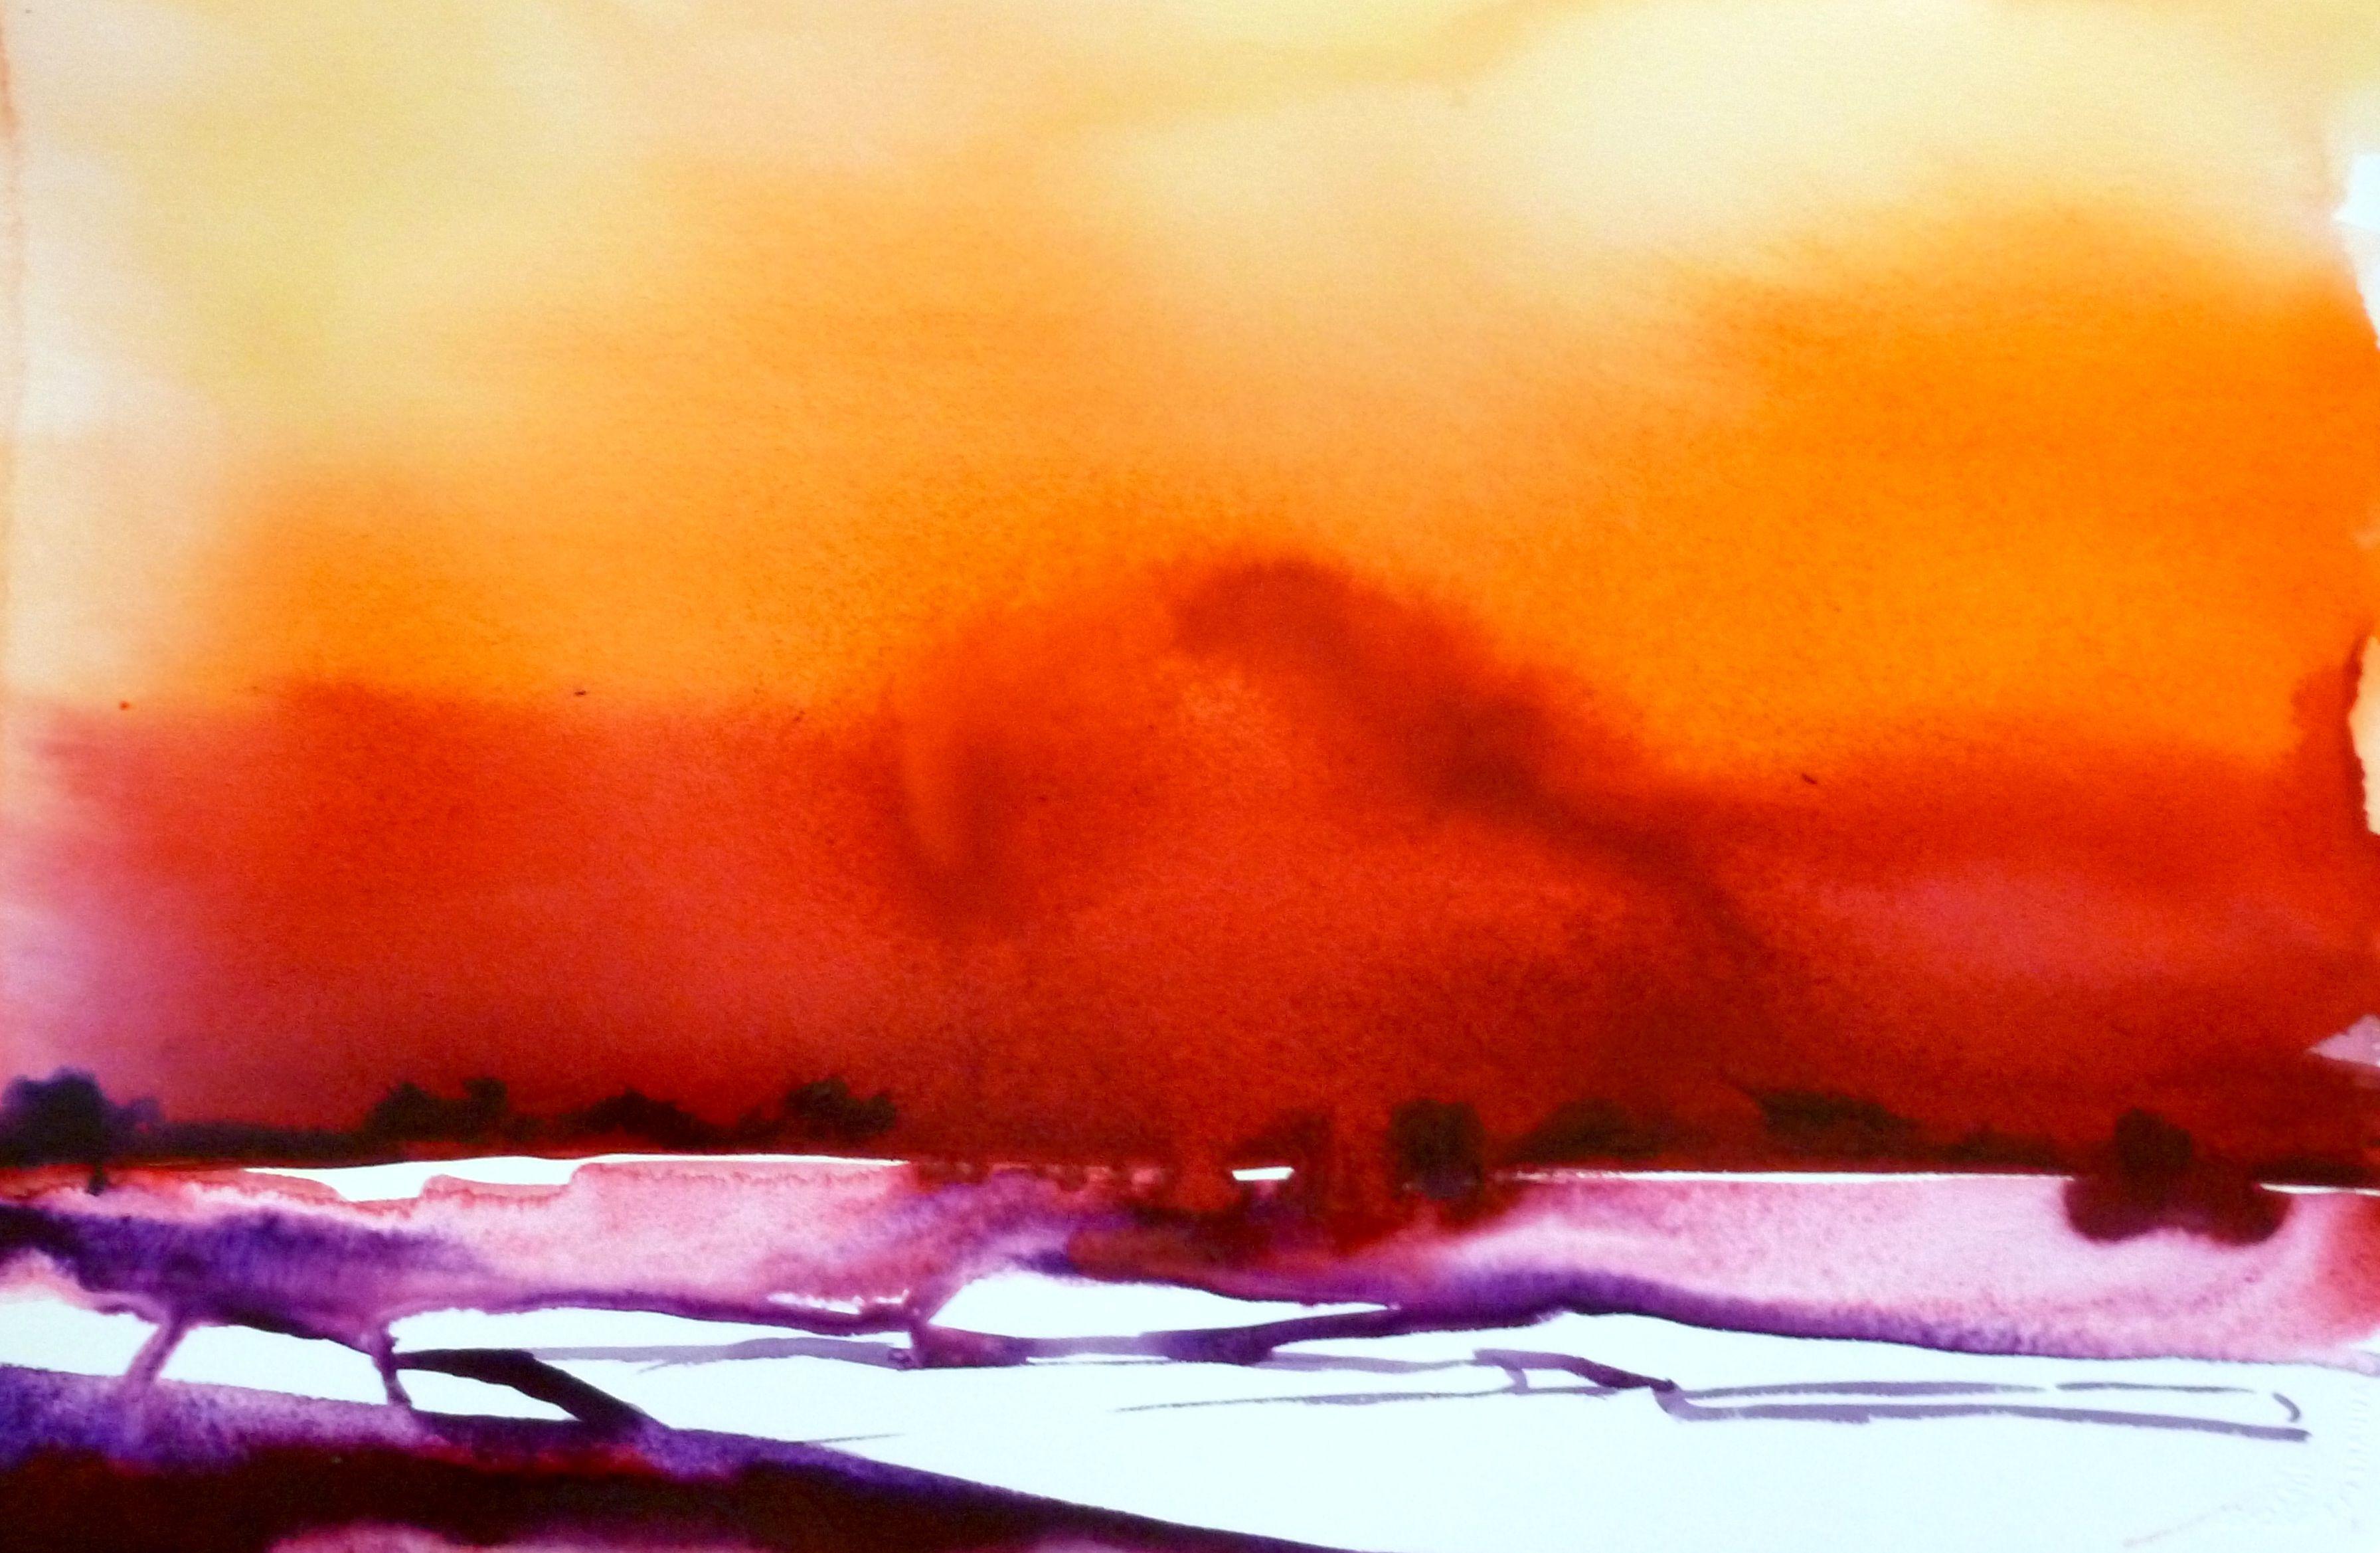 Aquarelle Splash Poisk V Google Abstract Artwork